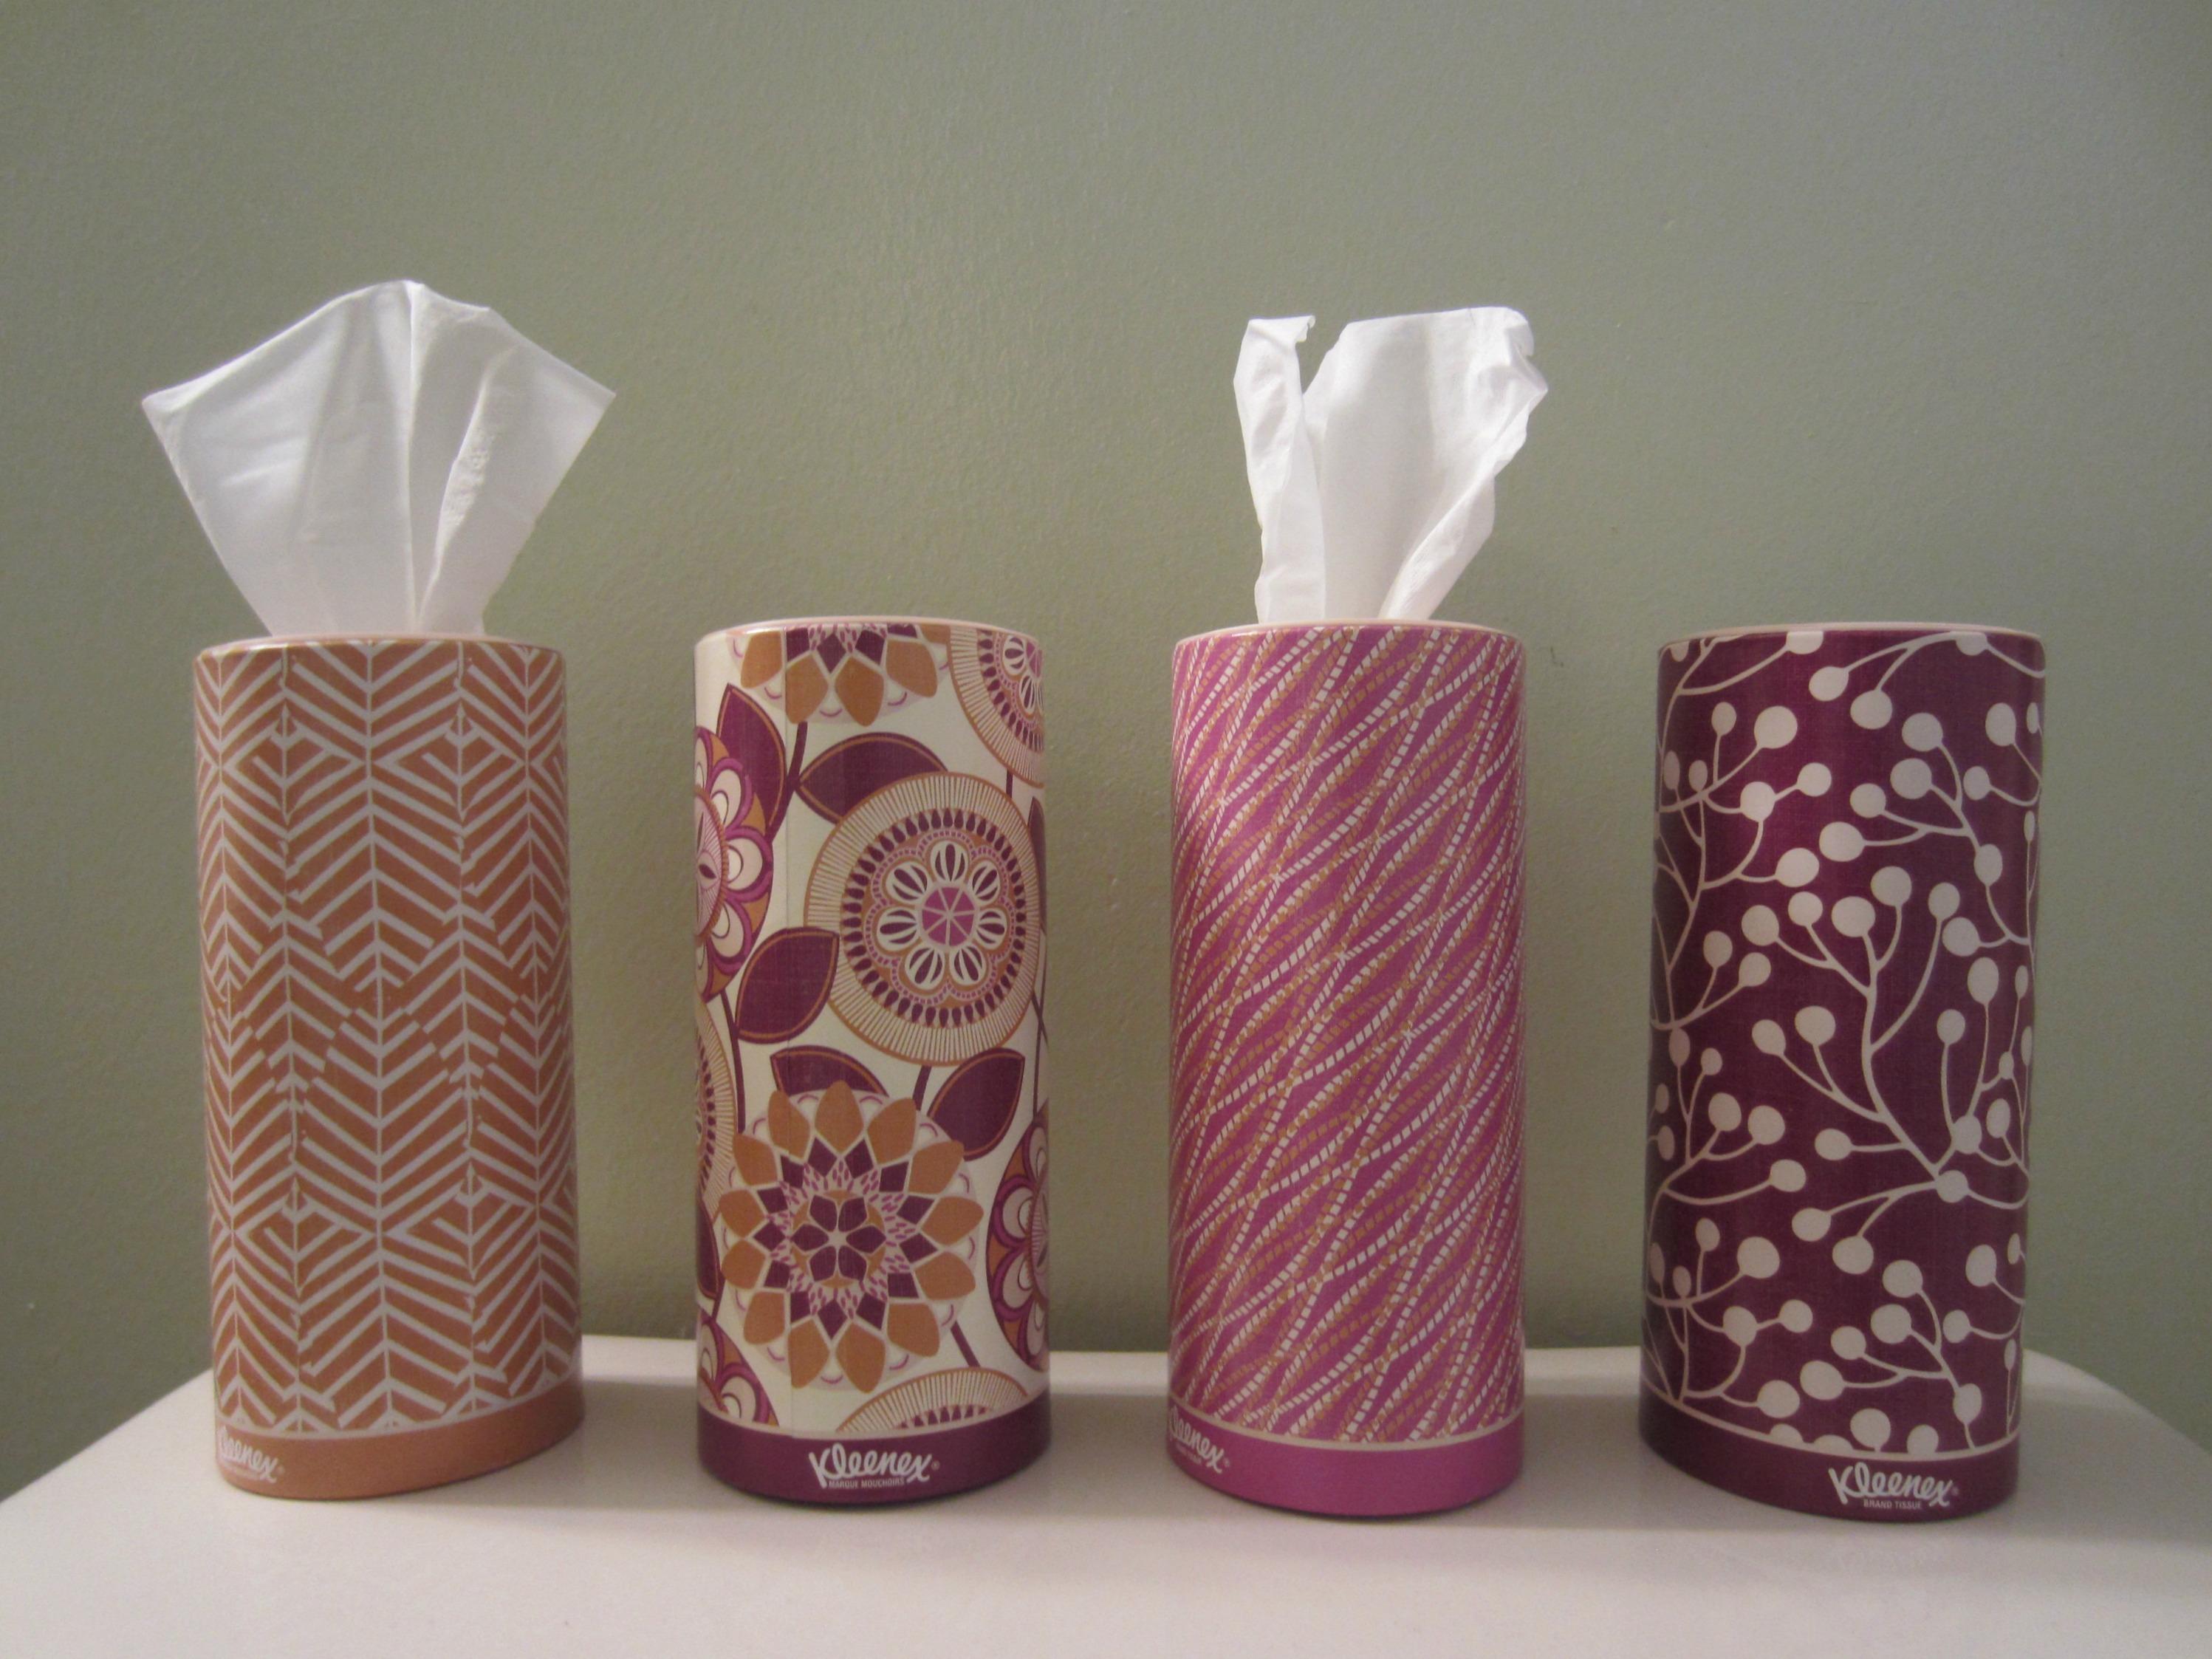 kleenex-tissues